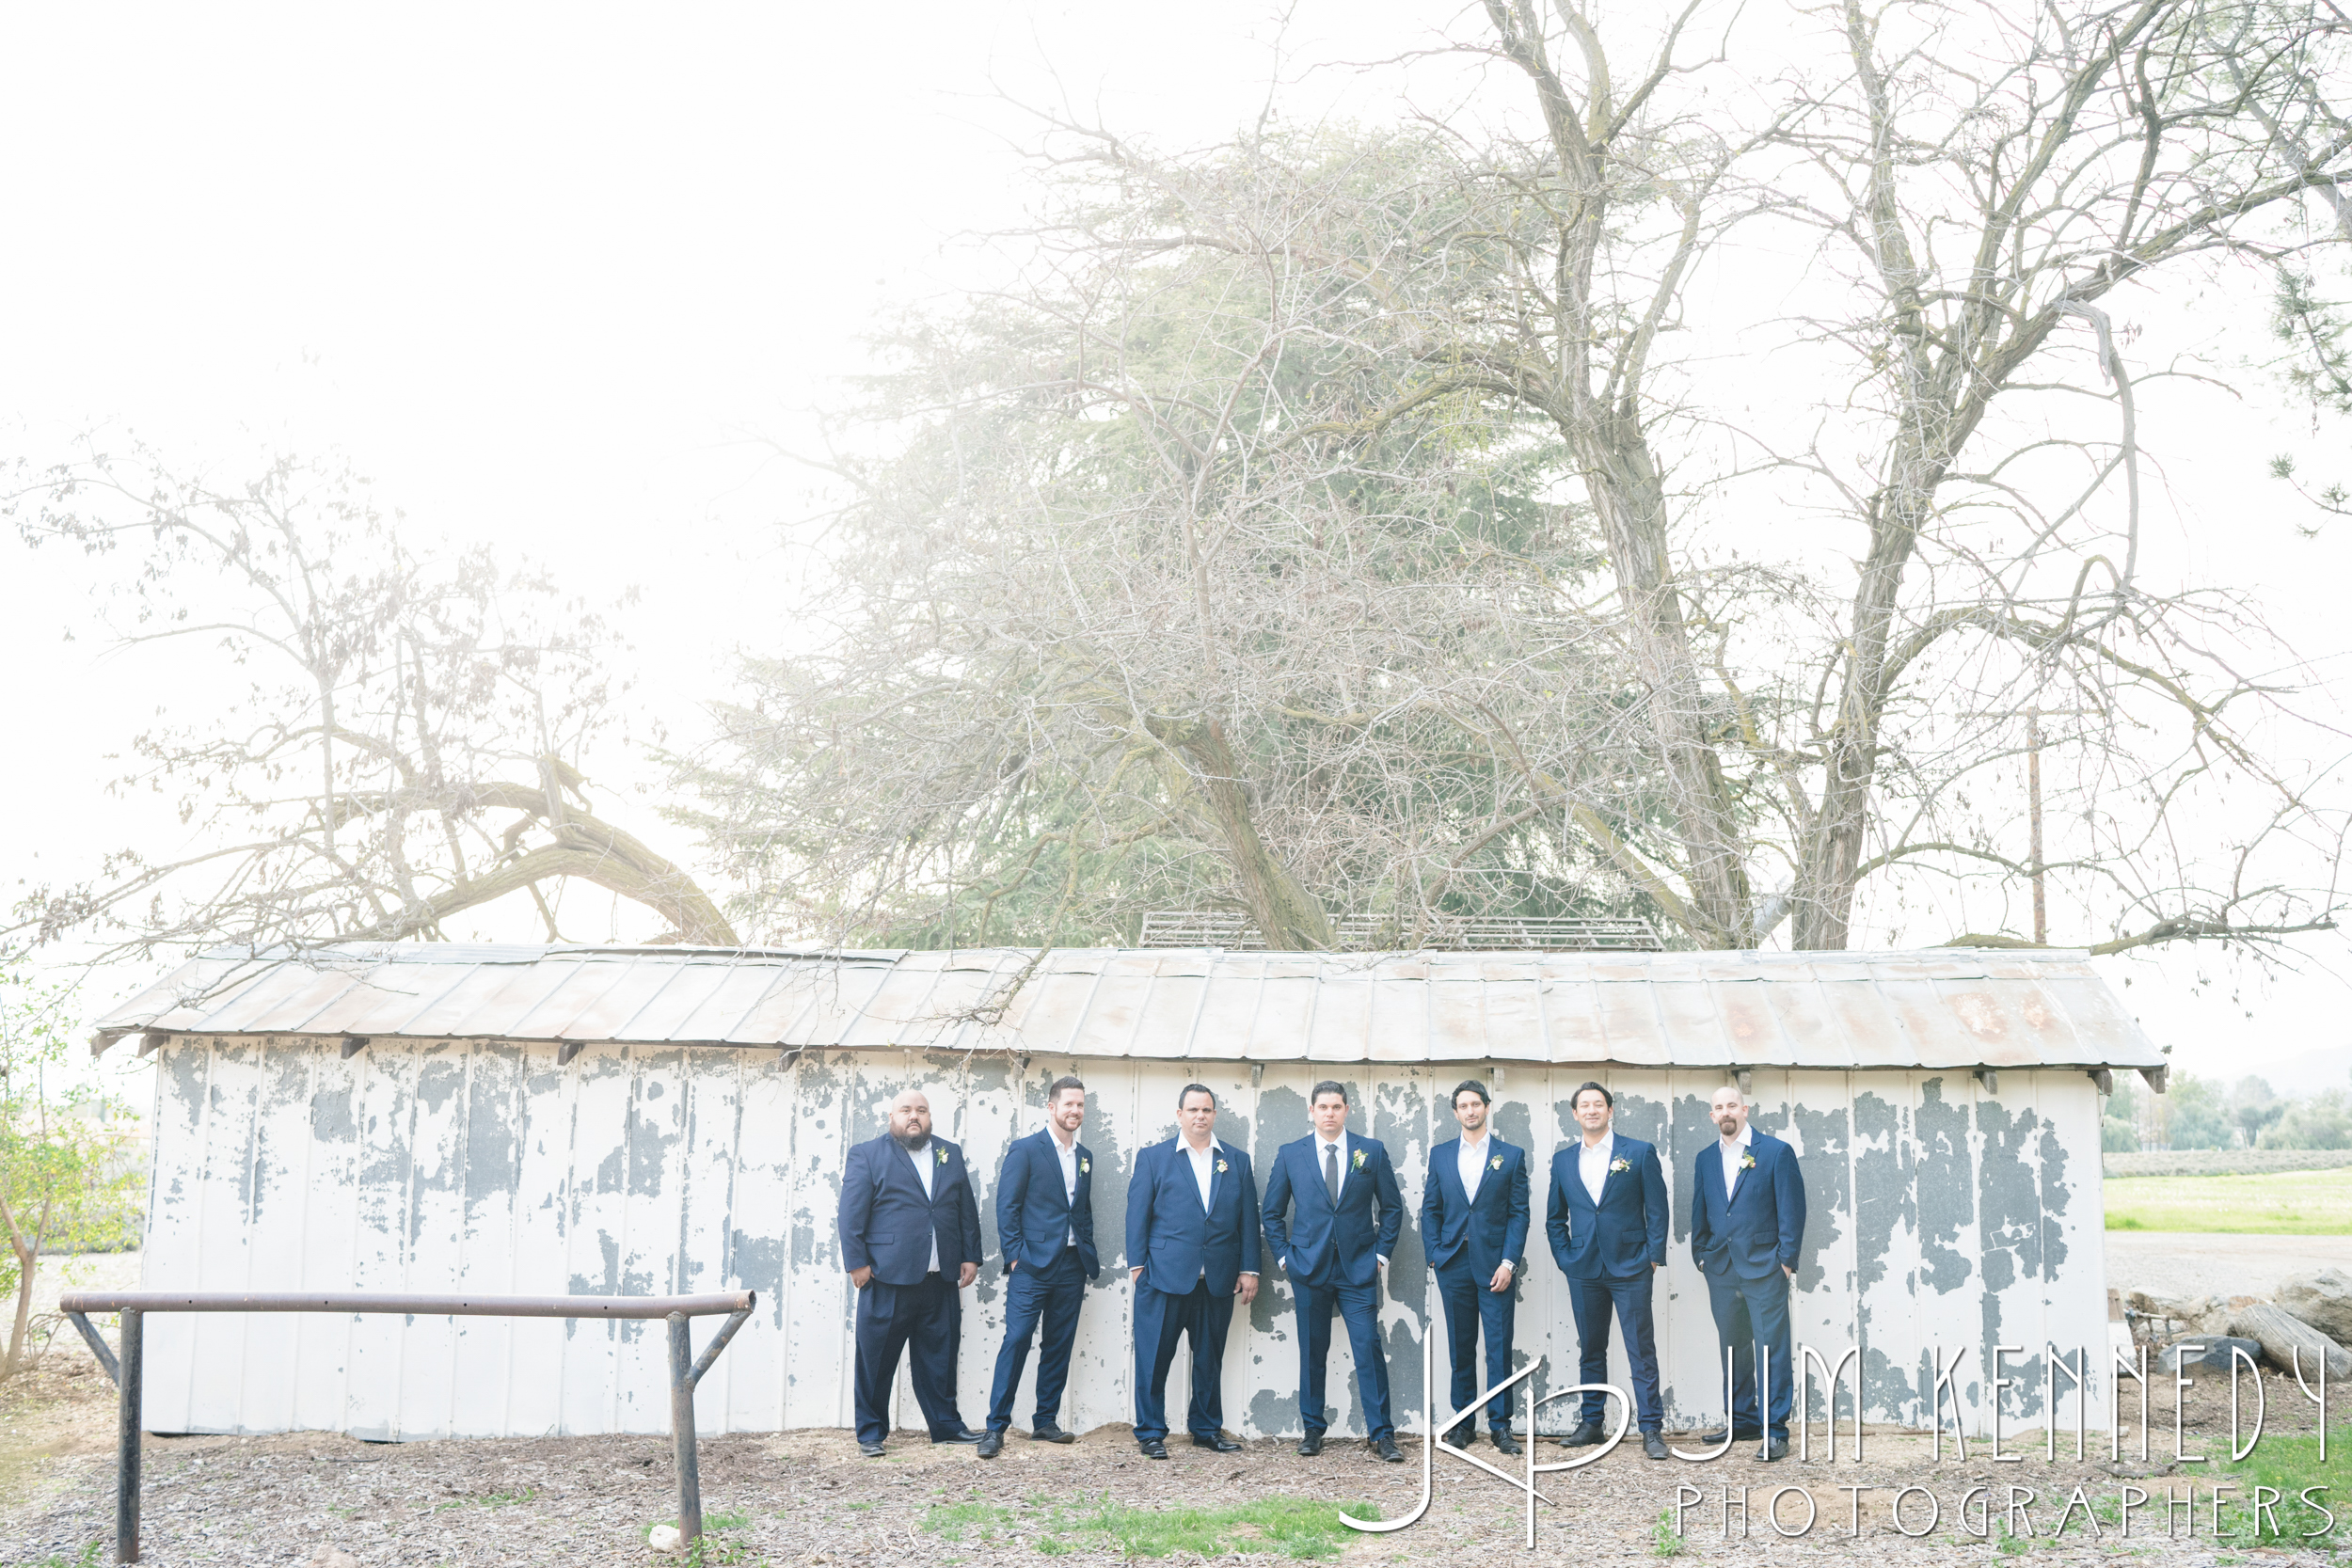 jim_kennedy_photographers_highland_springs_wedding_caitlyn_0093.jpg